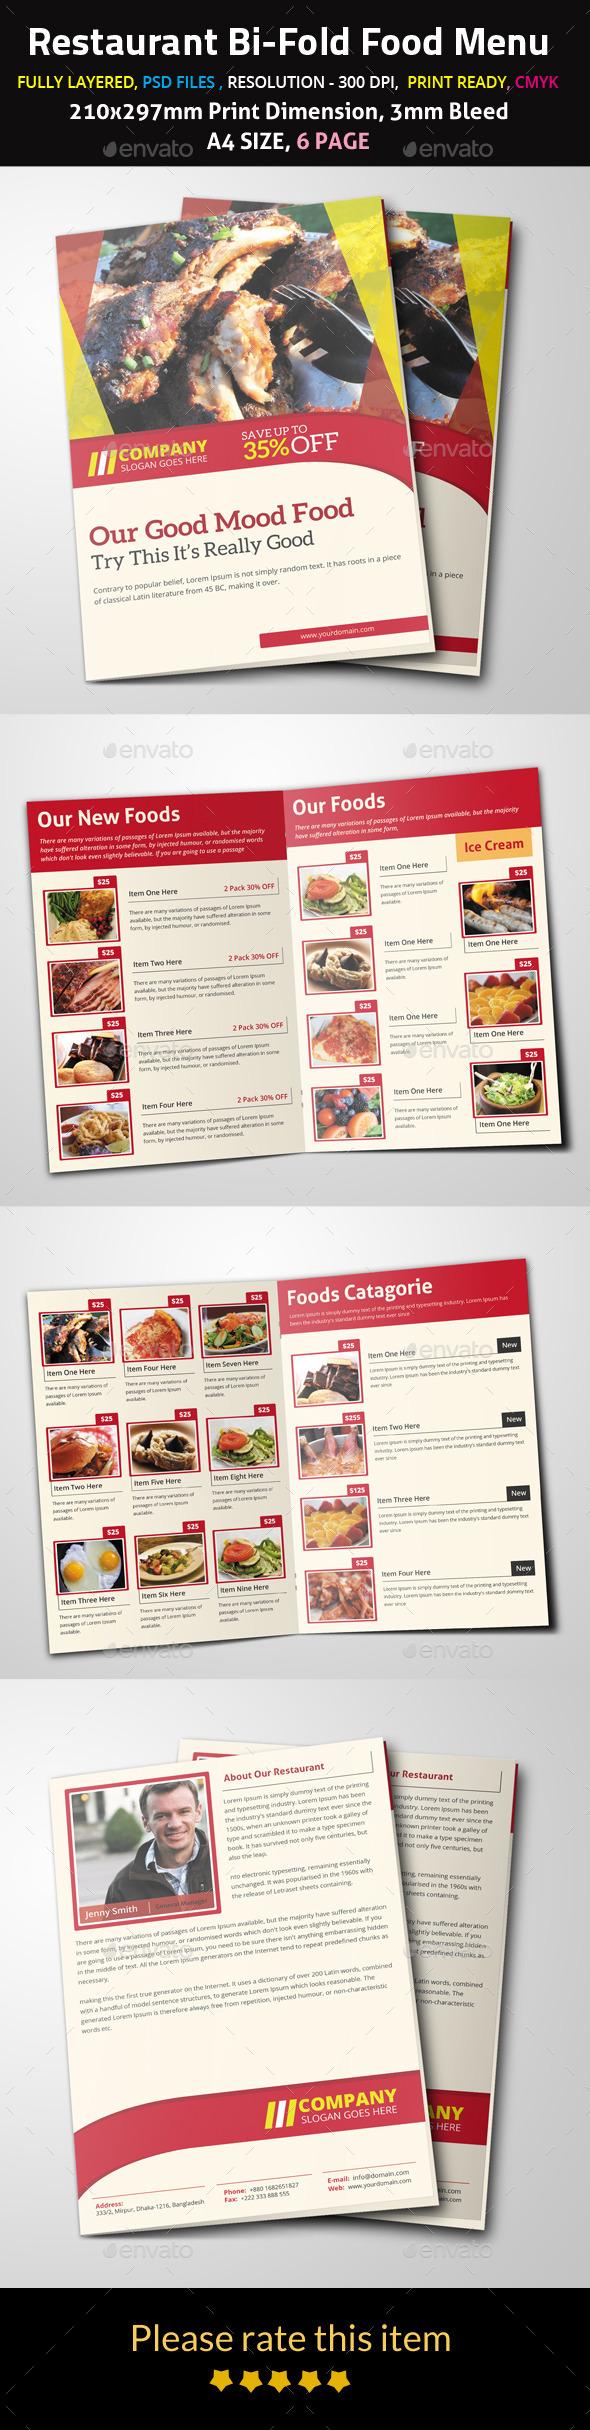 GraphicRiver Restaurant Bi-Fold Food Menu 9691639